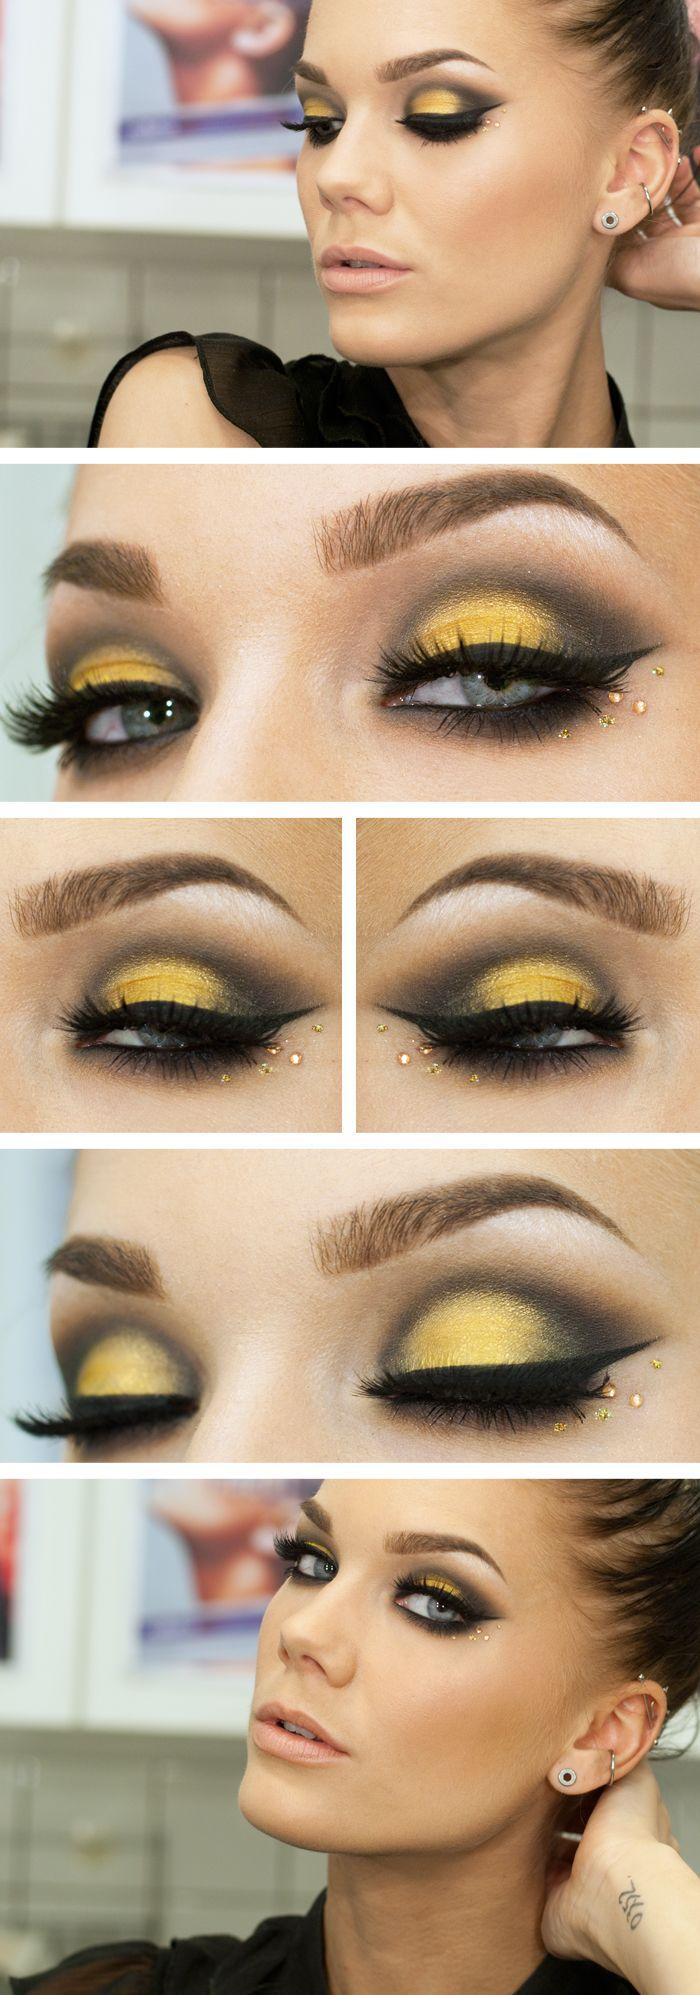 Faddish-Yellow-Eye-Makeup-Tutorial